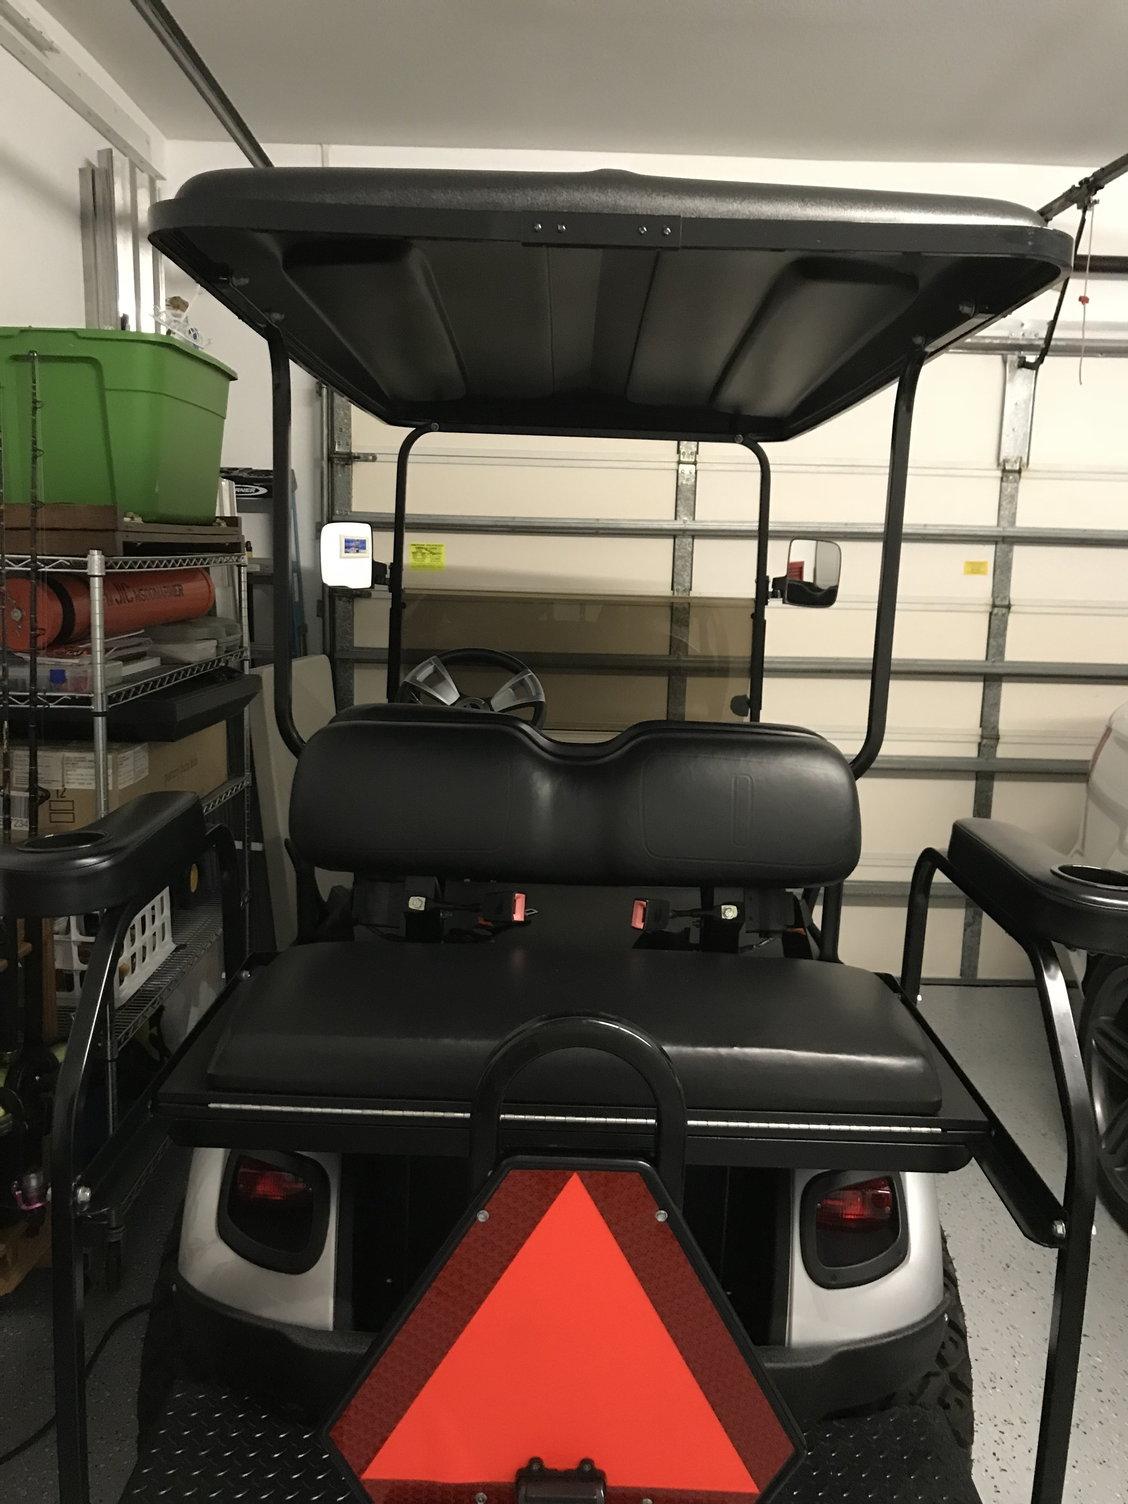 2016 Ez Go S4 Express Electric Golf Cart Fully Street